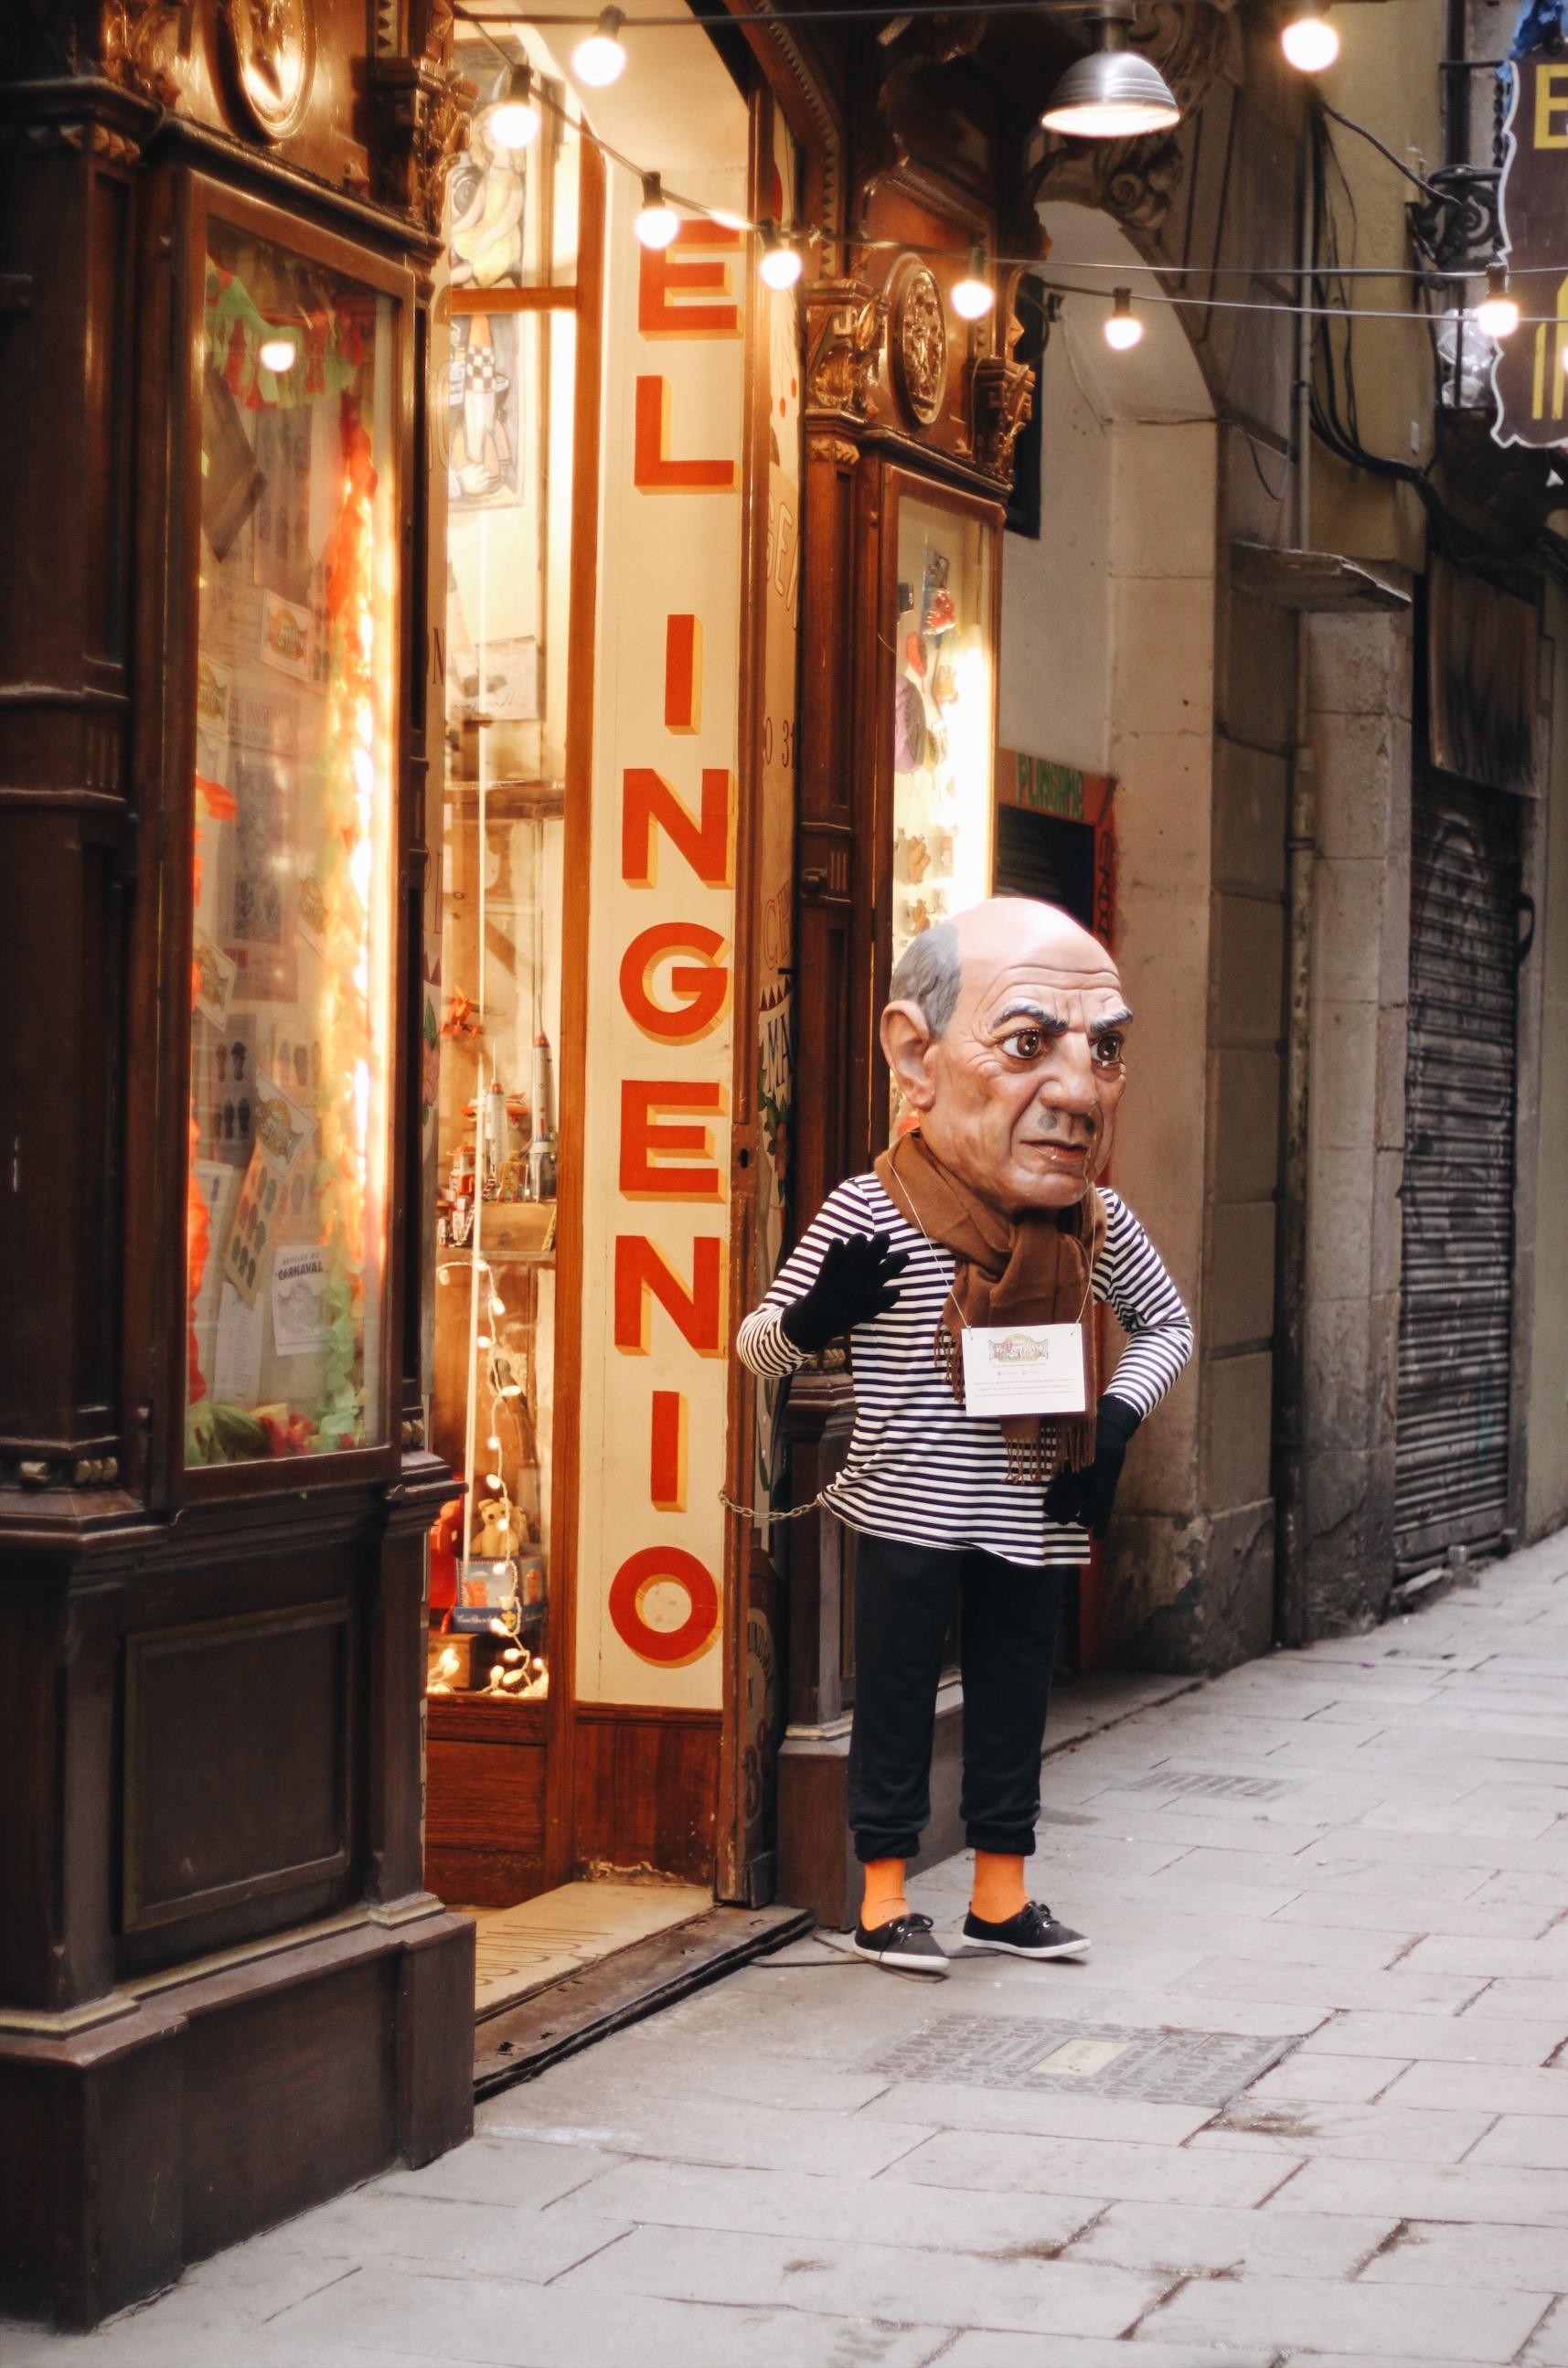 El Ingenio, Barcelona